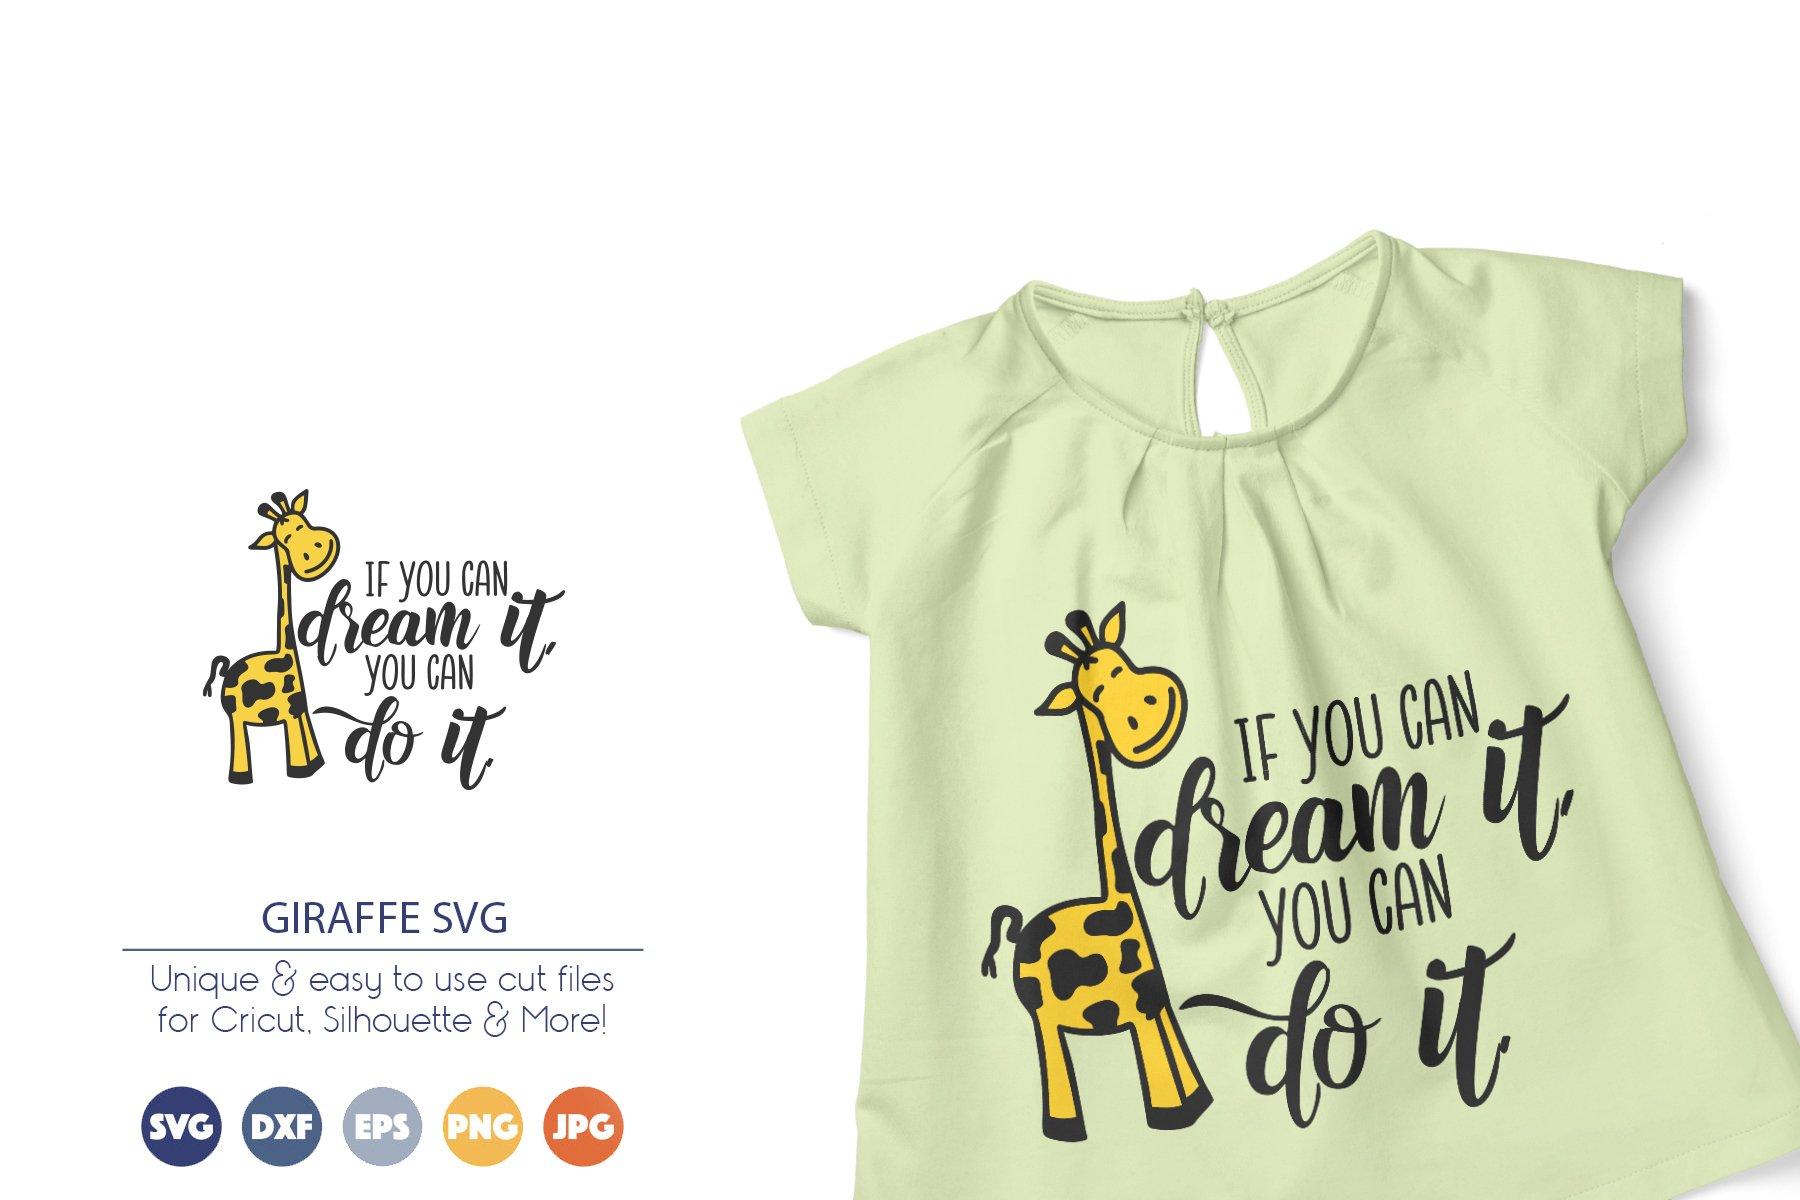 Giraffe SVG | Inspirational SVG example image 1